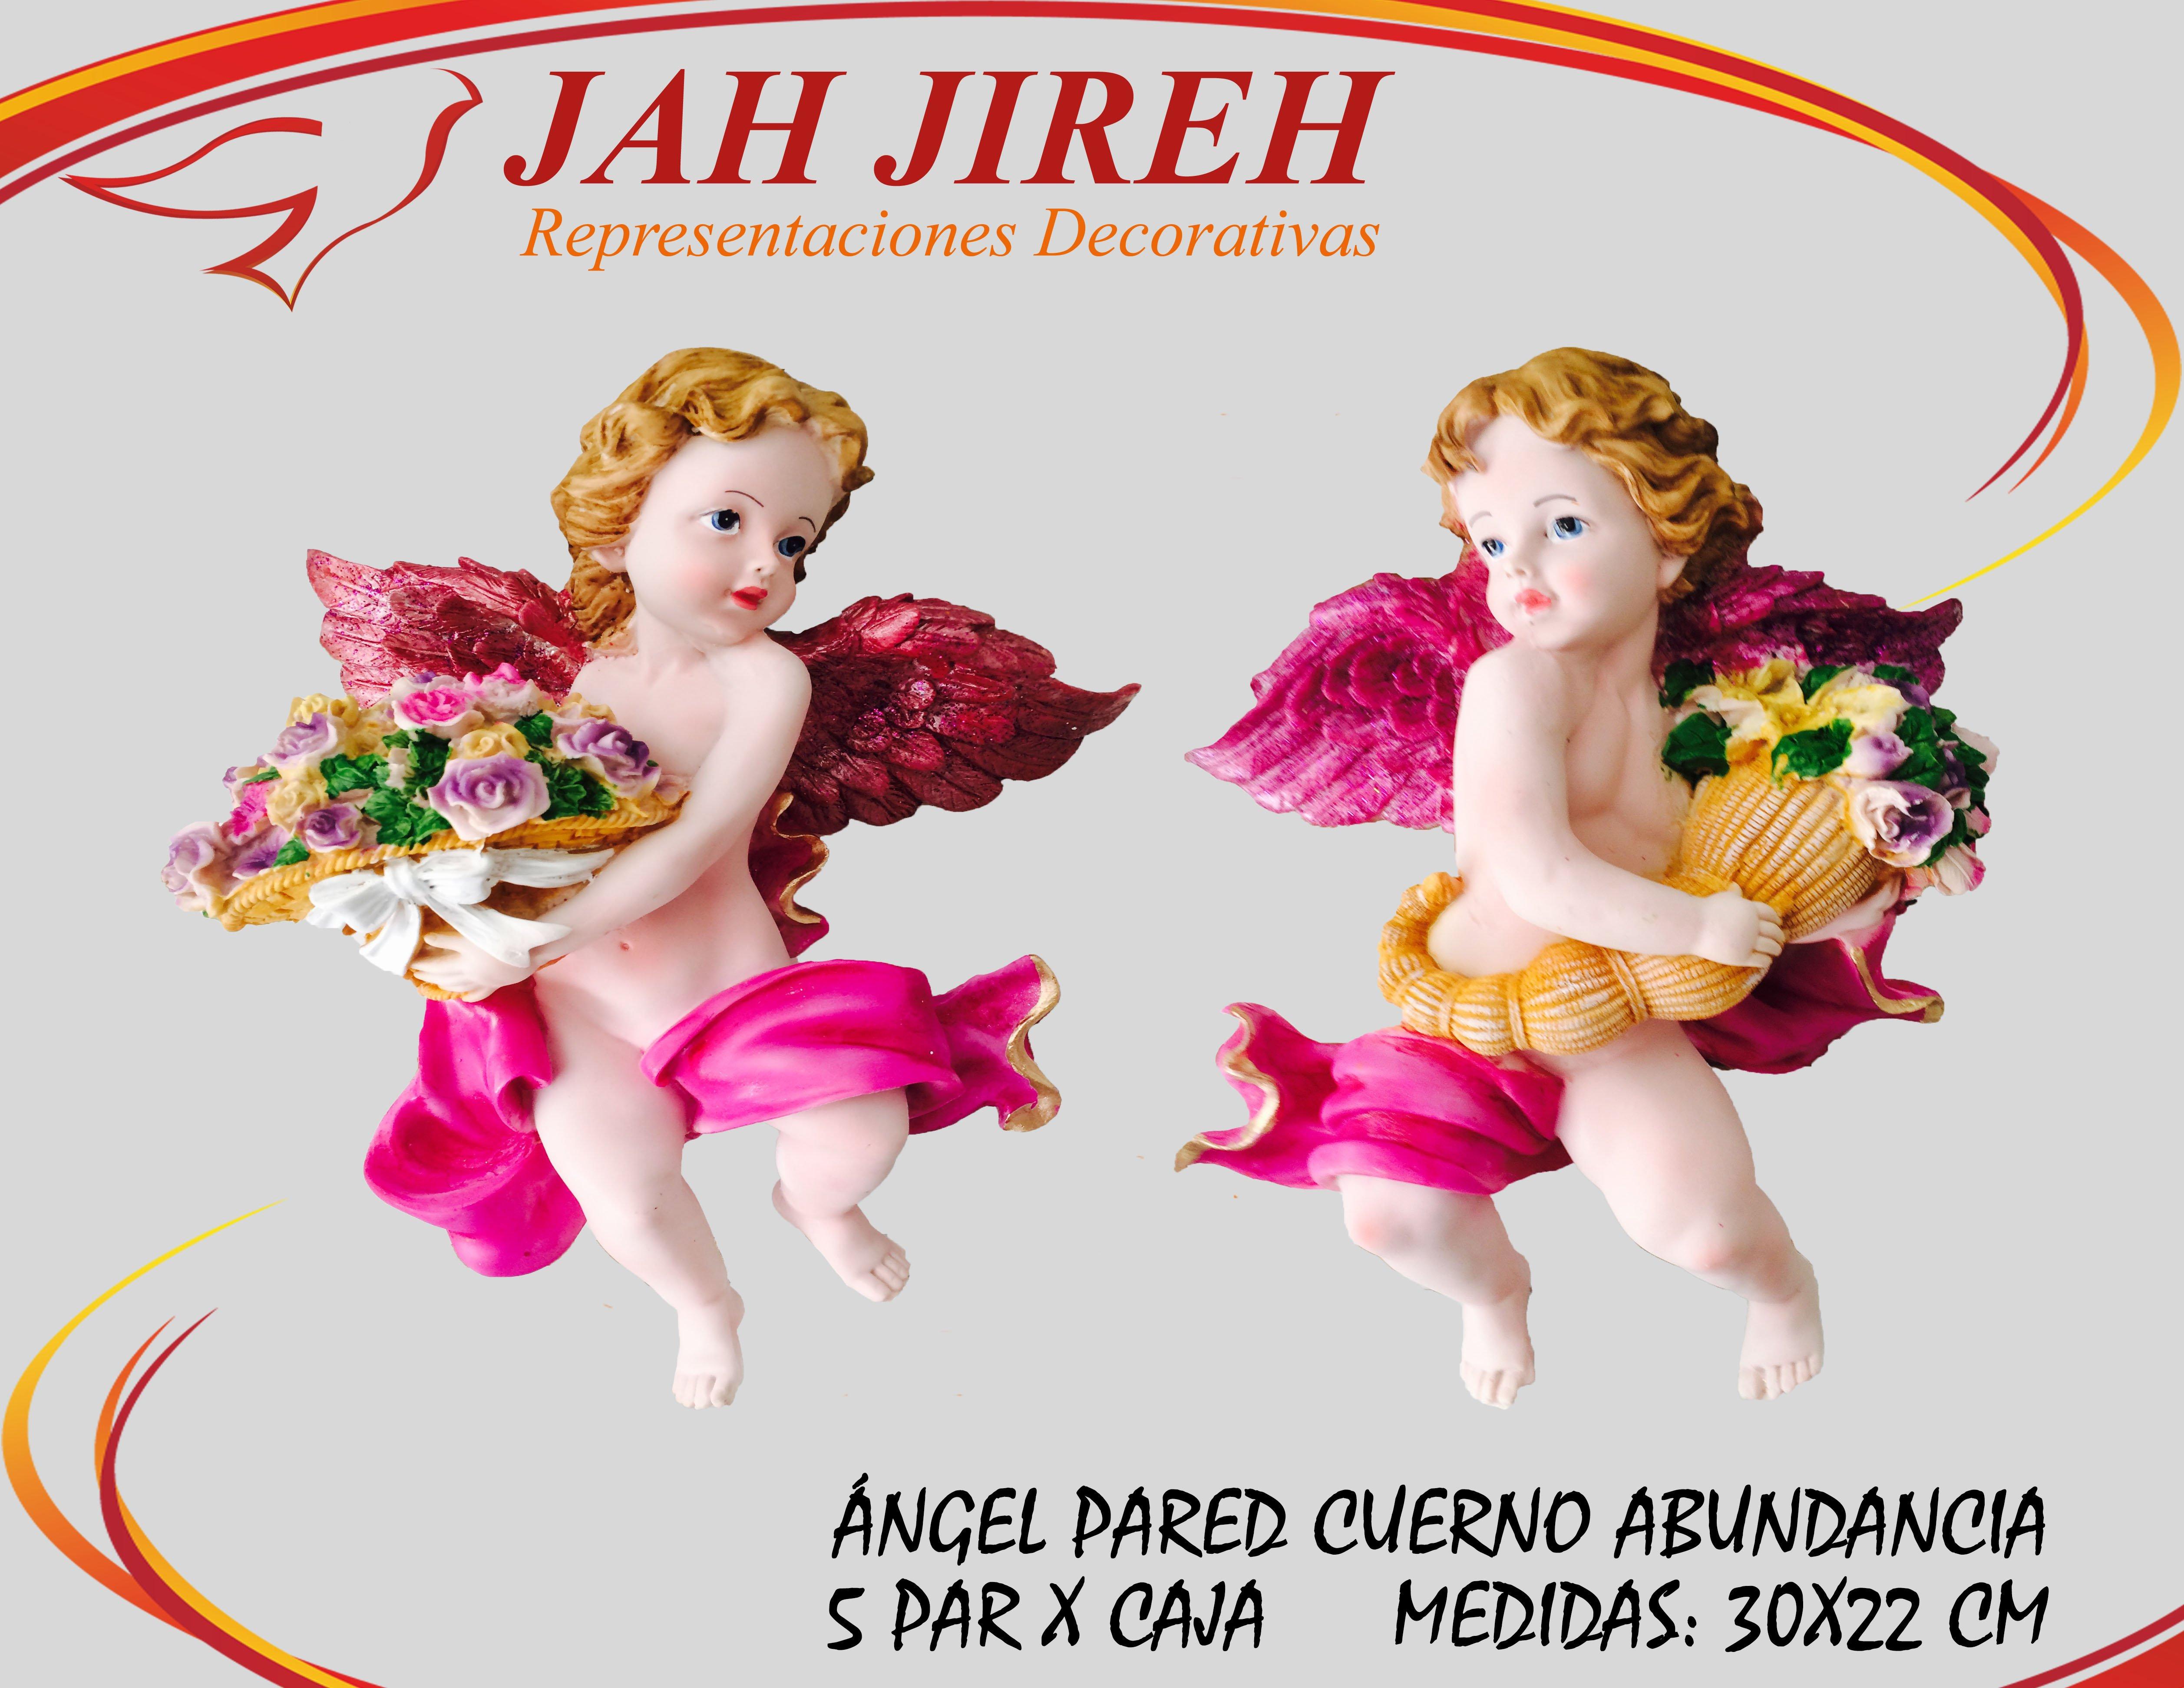 https://0201.nccdn.net/1_2/000/000/120/cf7/angel-pared-cuerno-abundancia.jpg